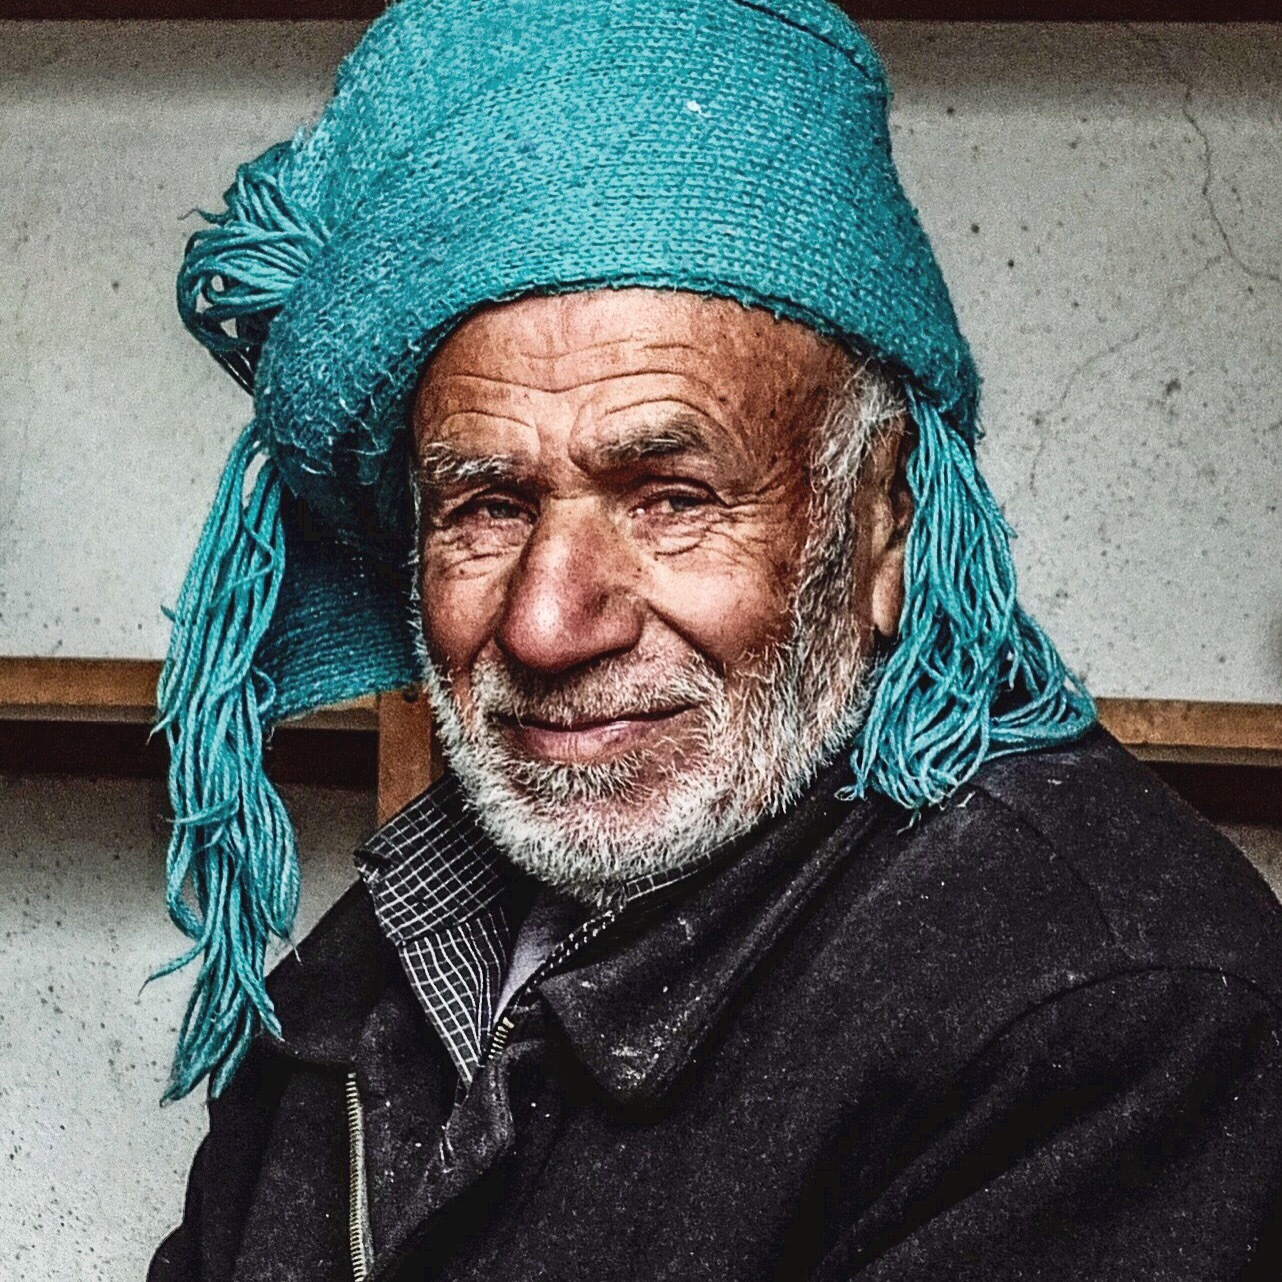 Untitled by Mustafa Tanrıverdi